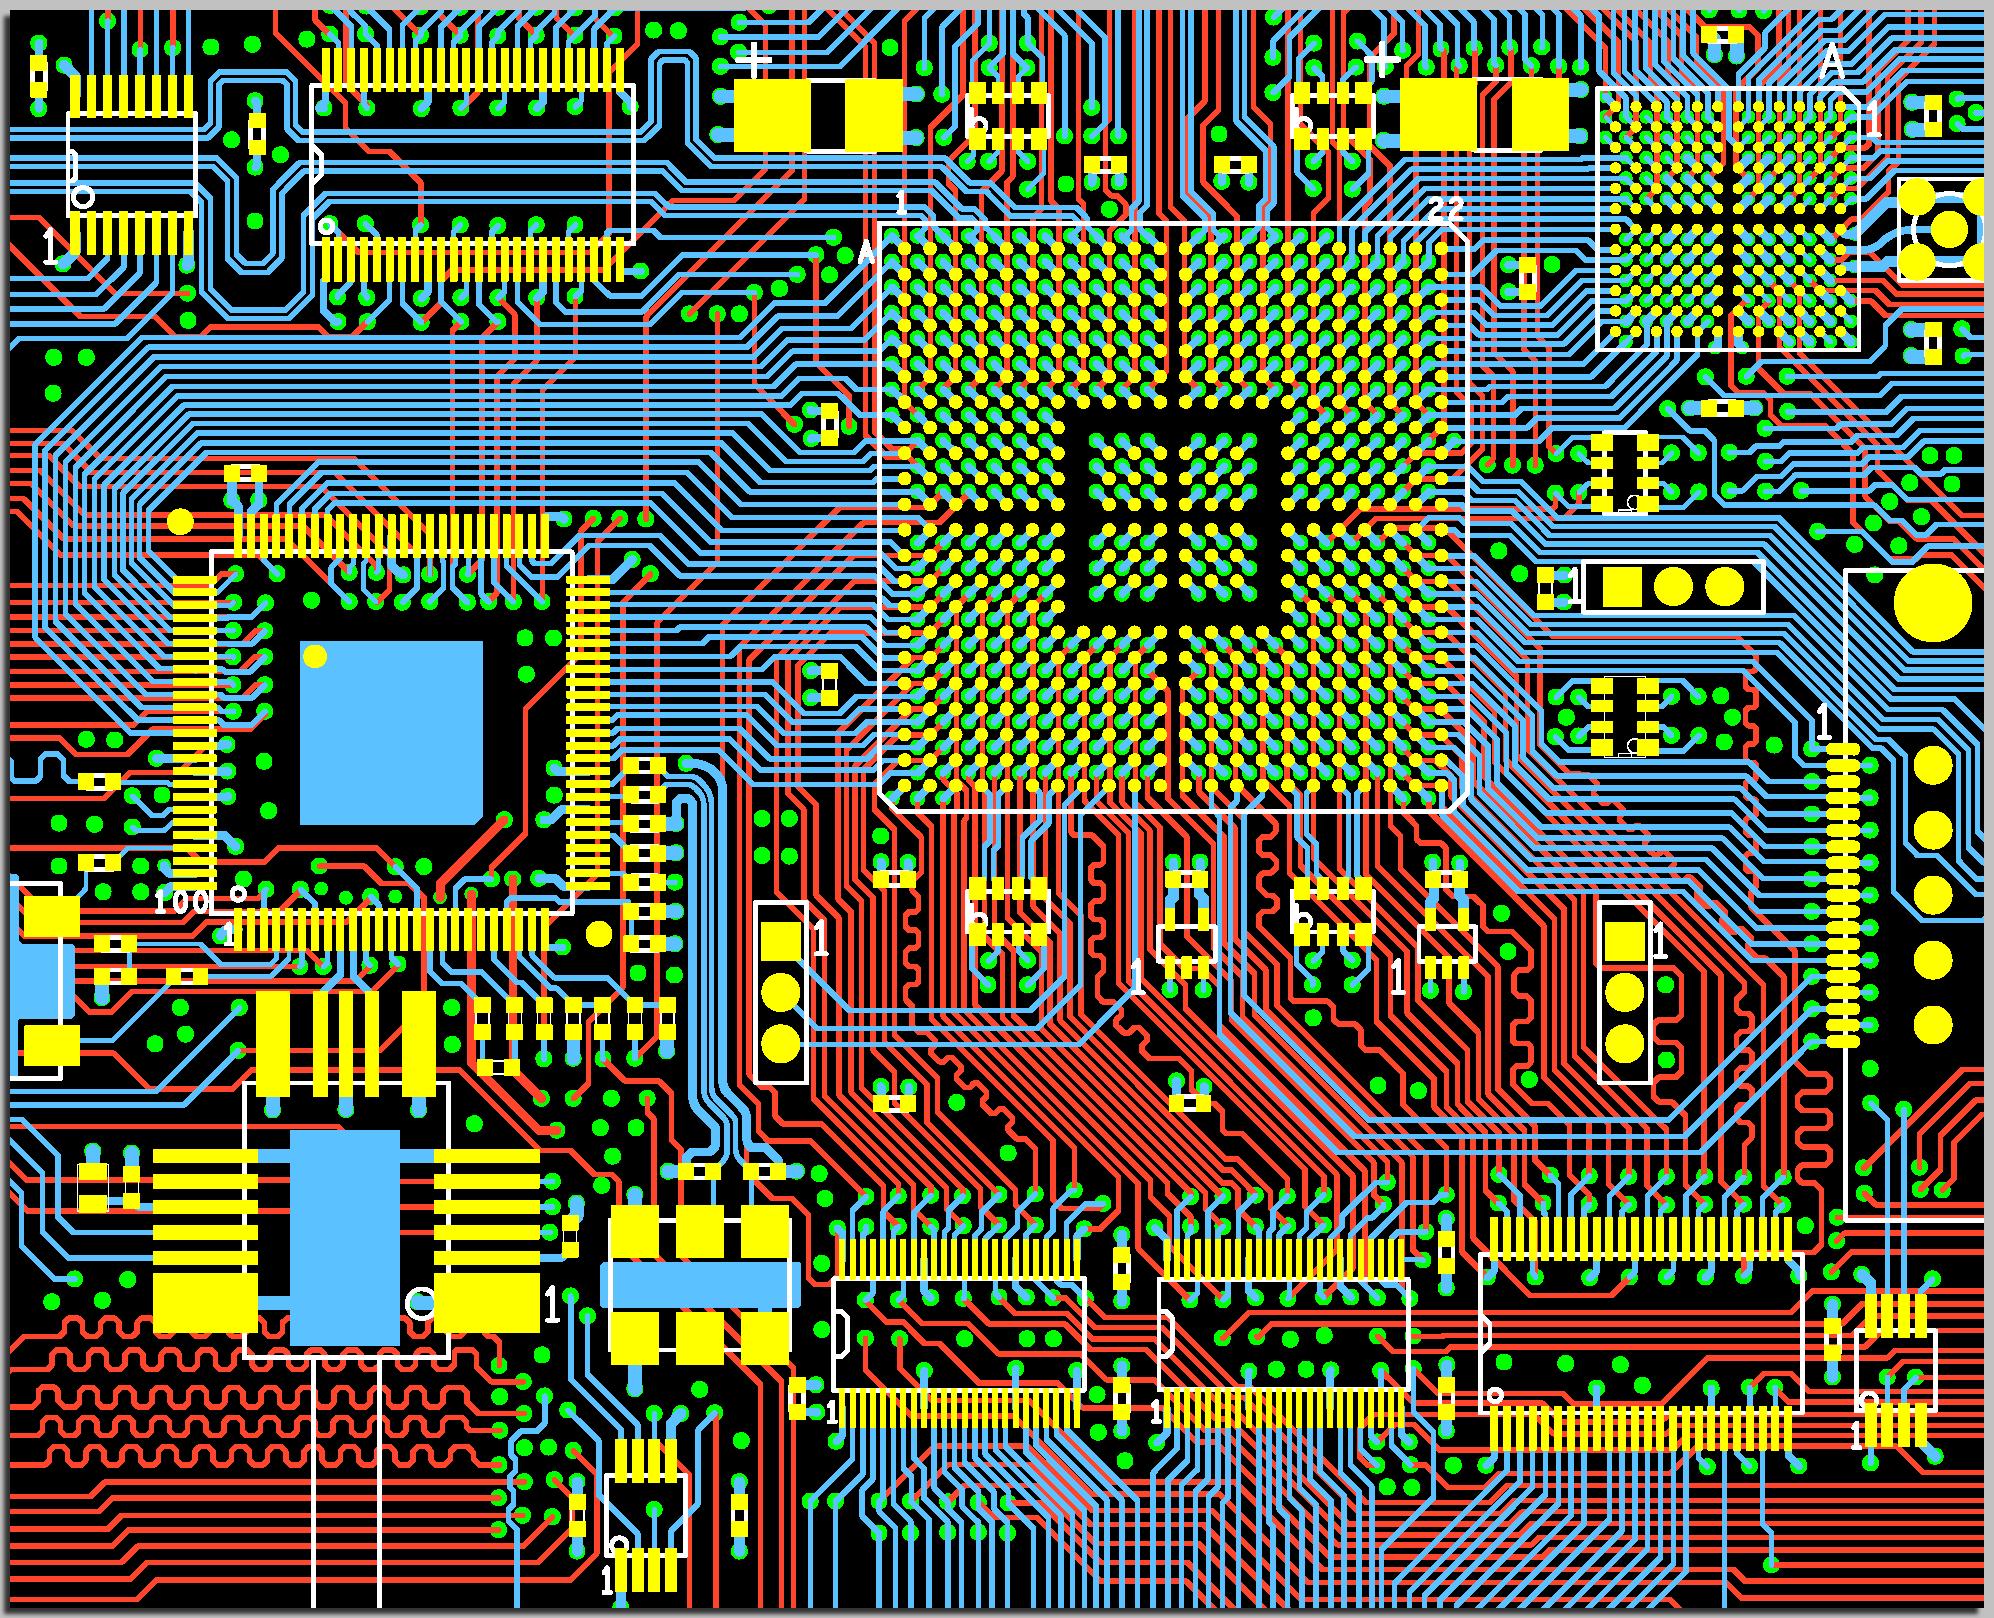 circuit design - Google Search   Pattern   Pinterest